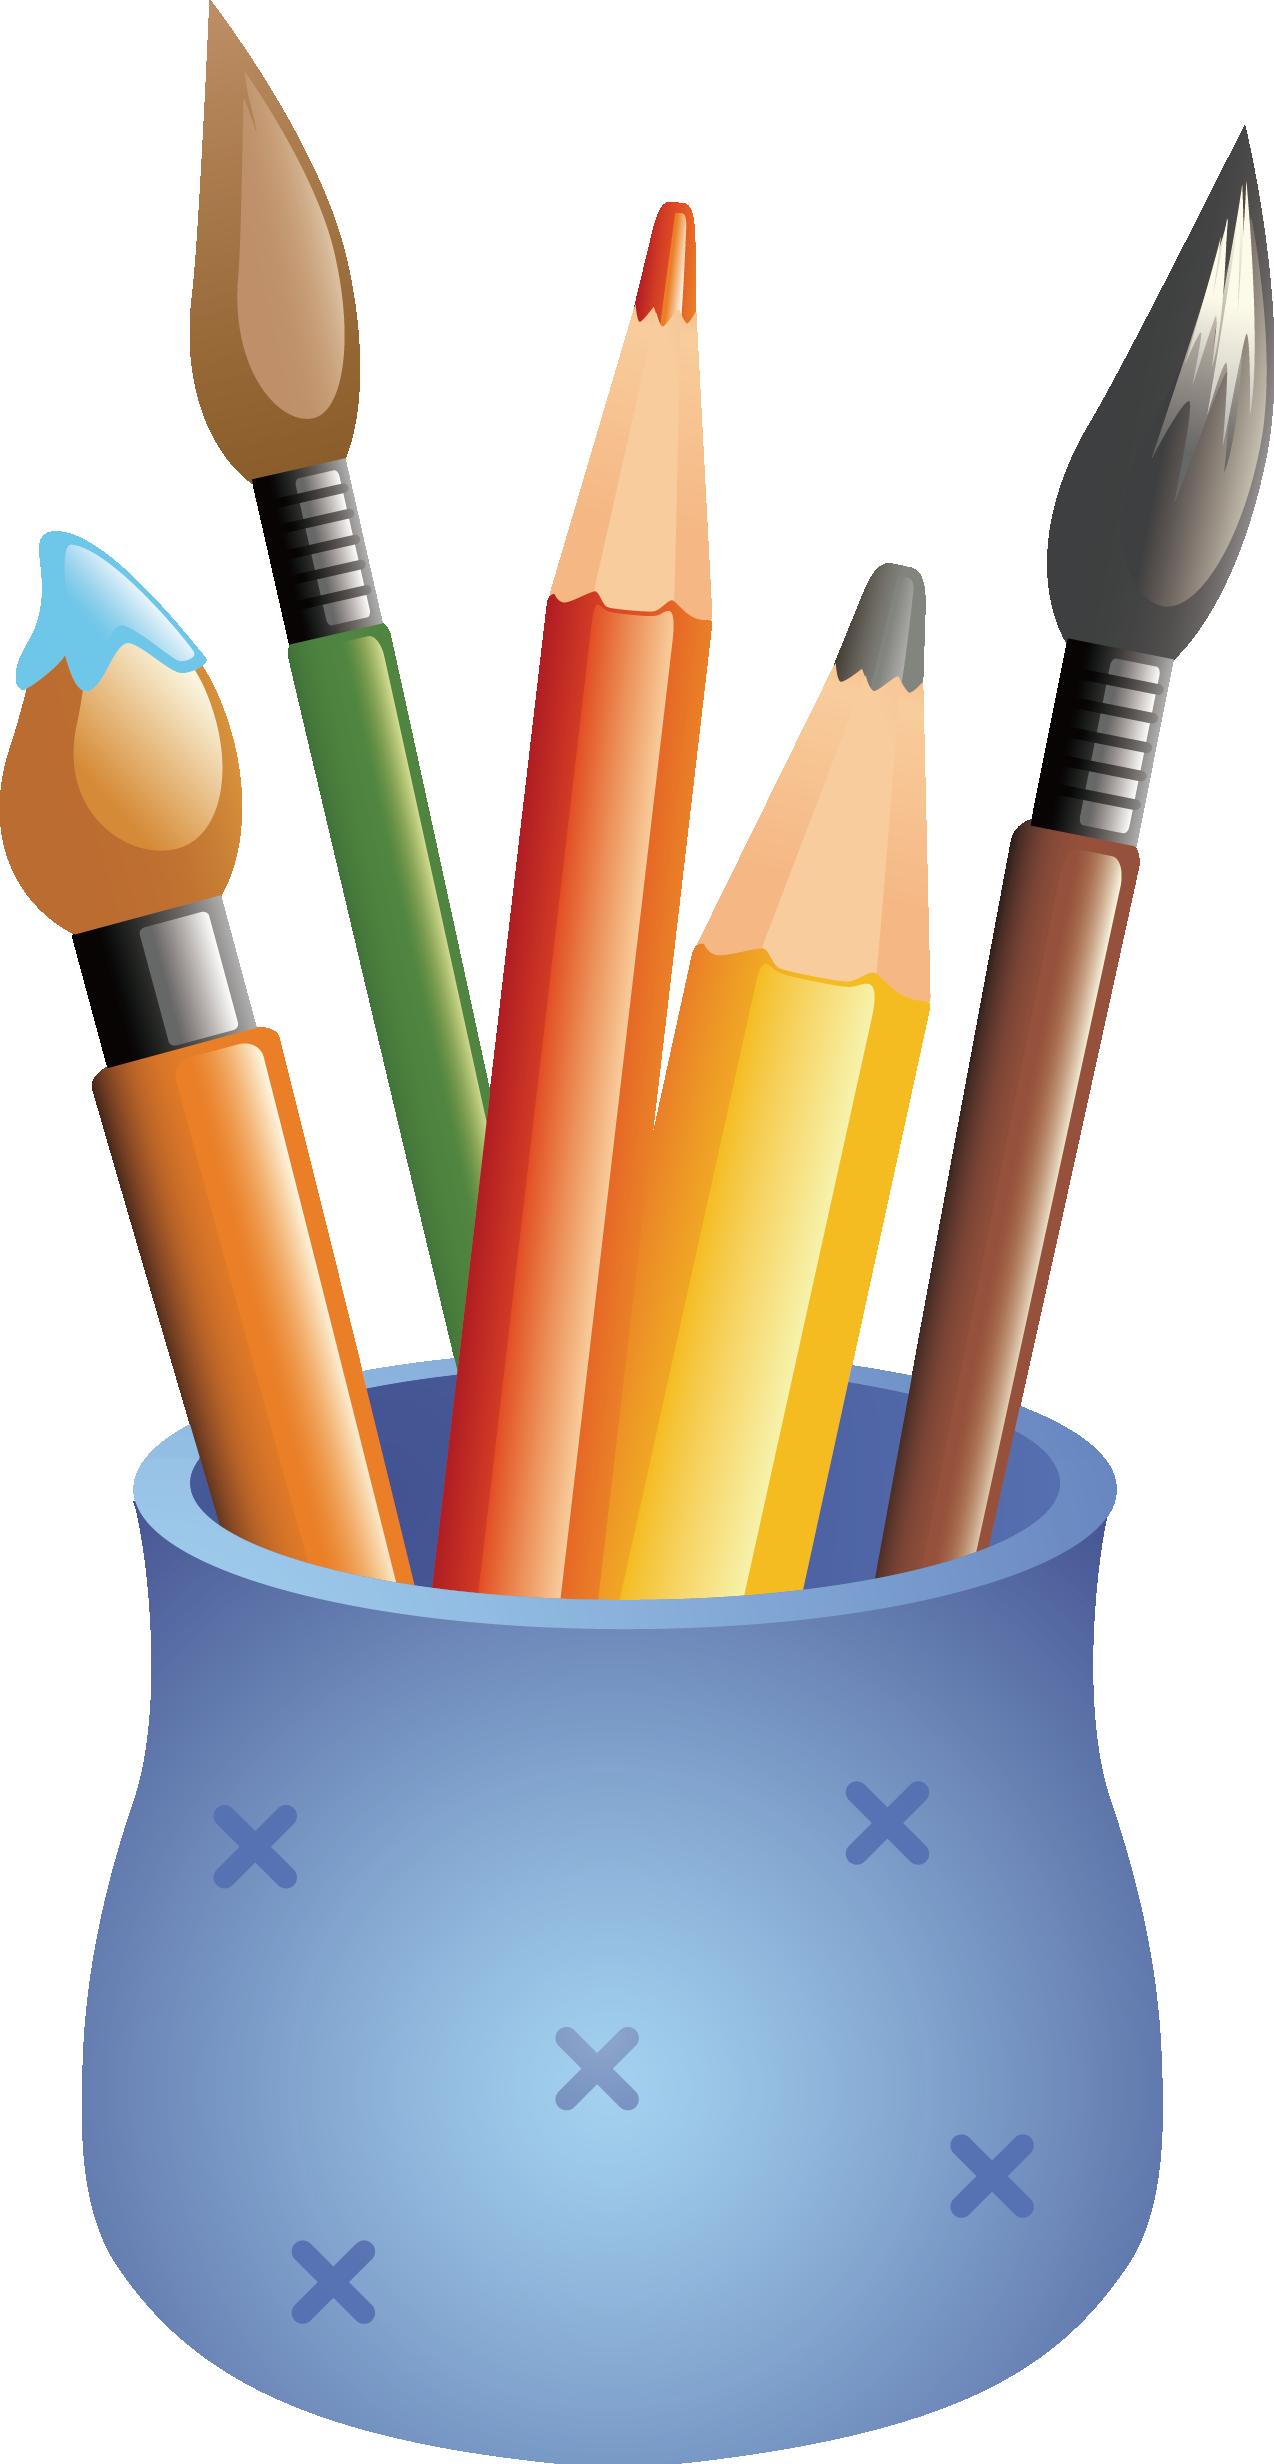 Case drawing cartoon pen. Paintbrush clipart colored pencil